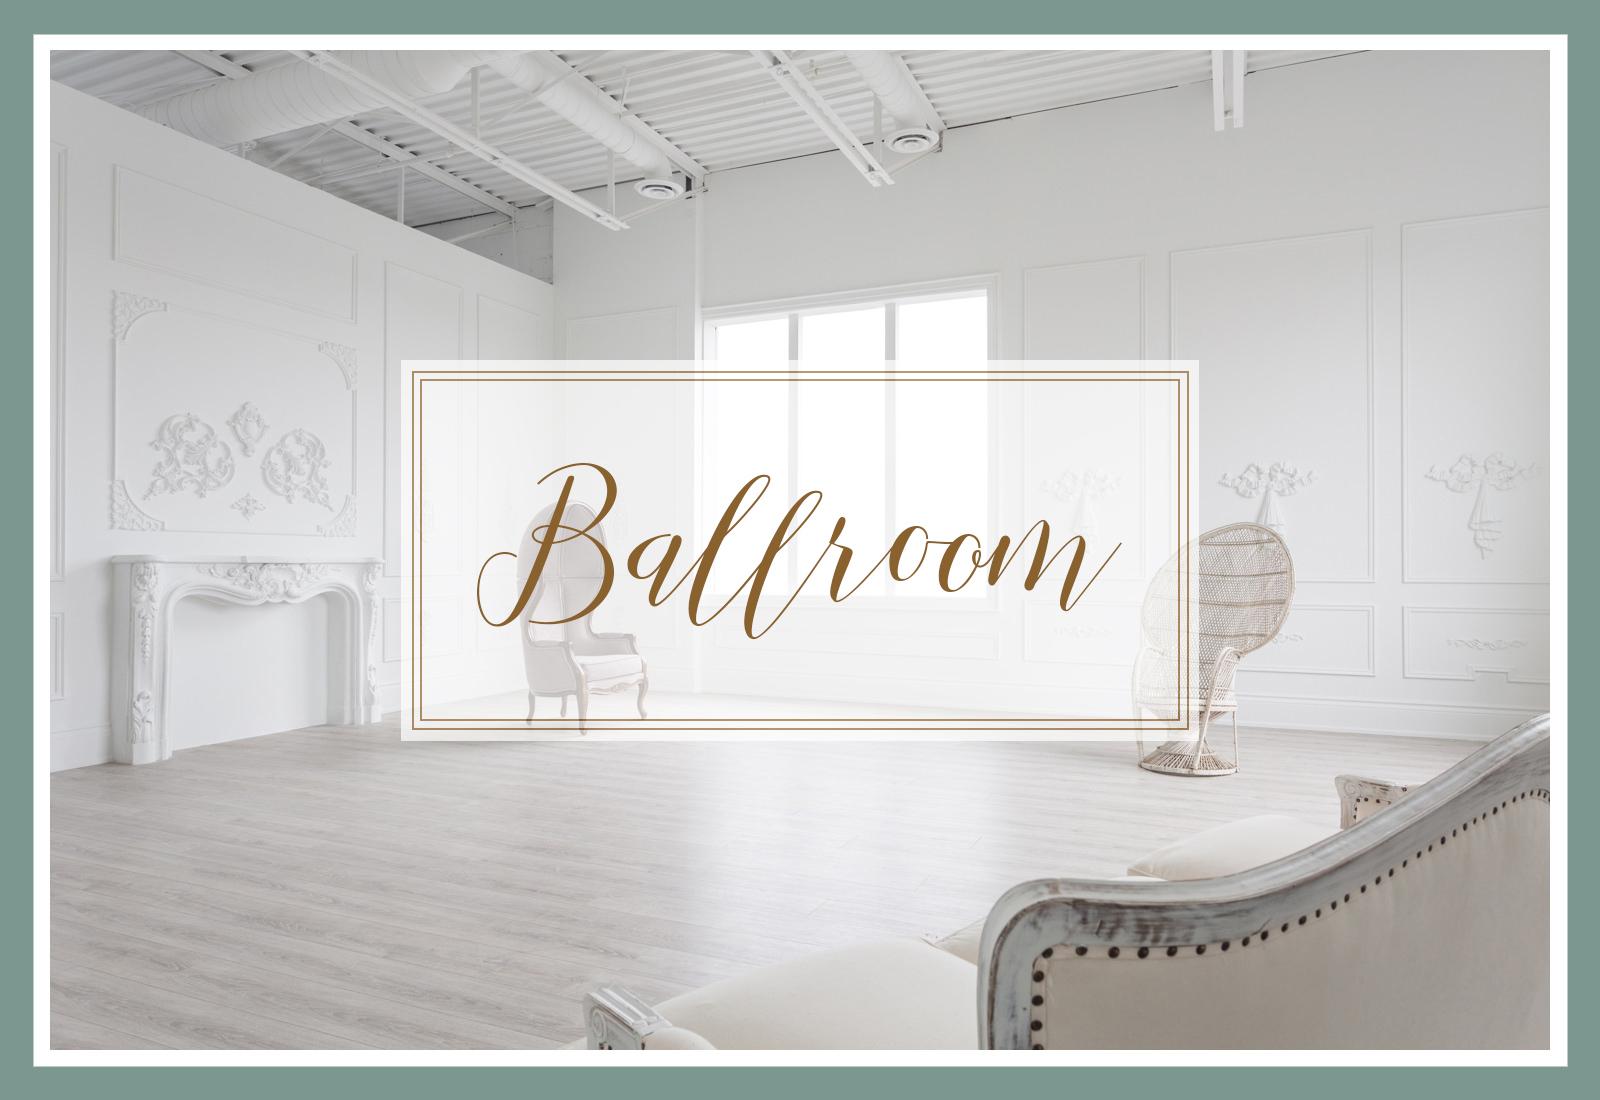 Ballroom Studio navigation